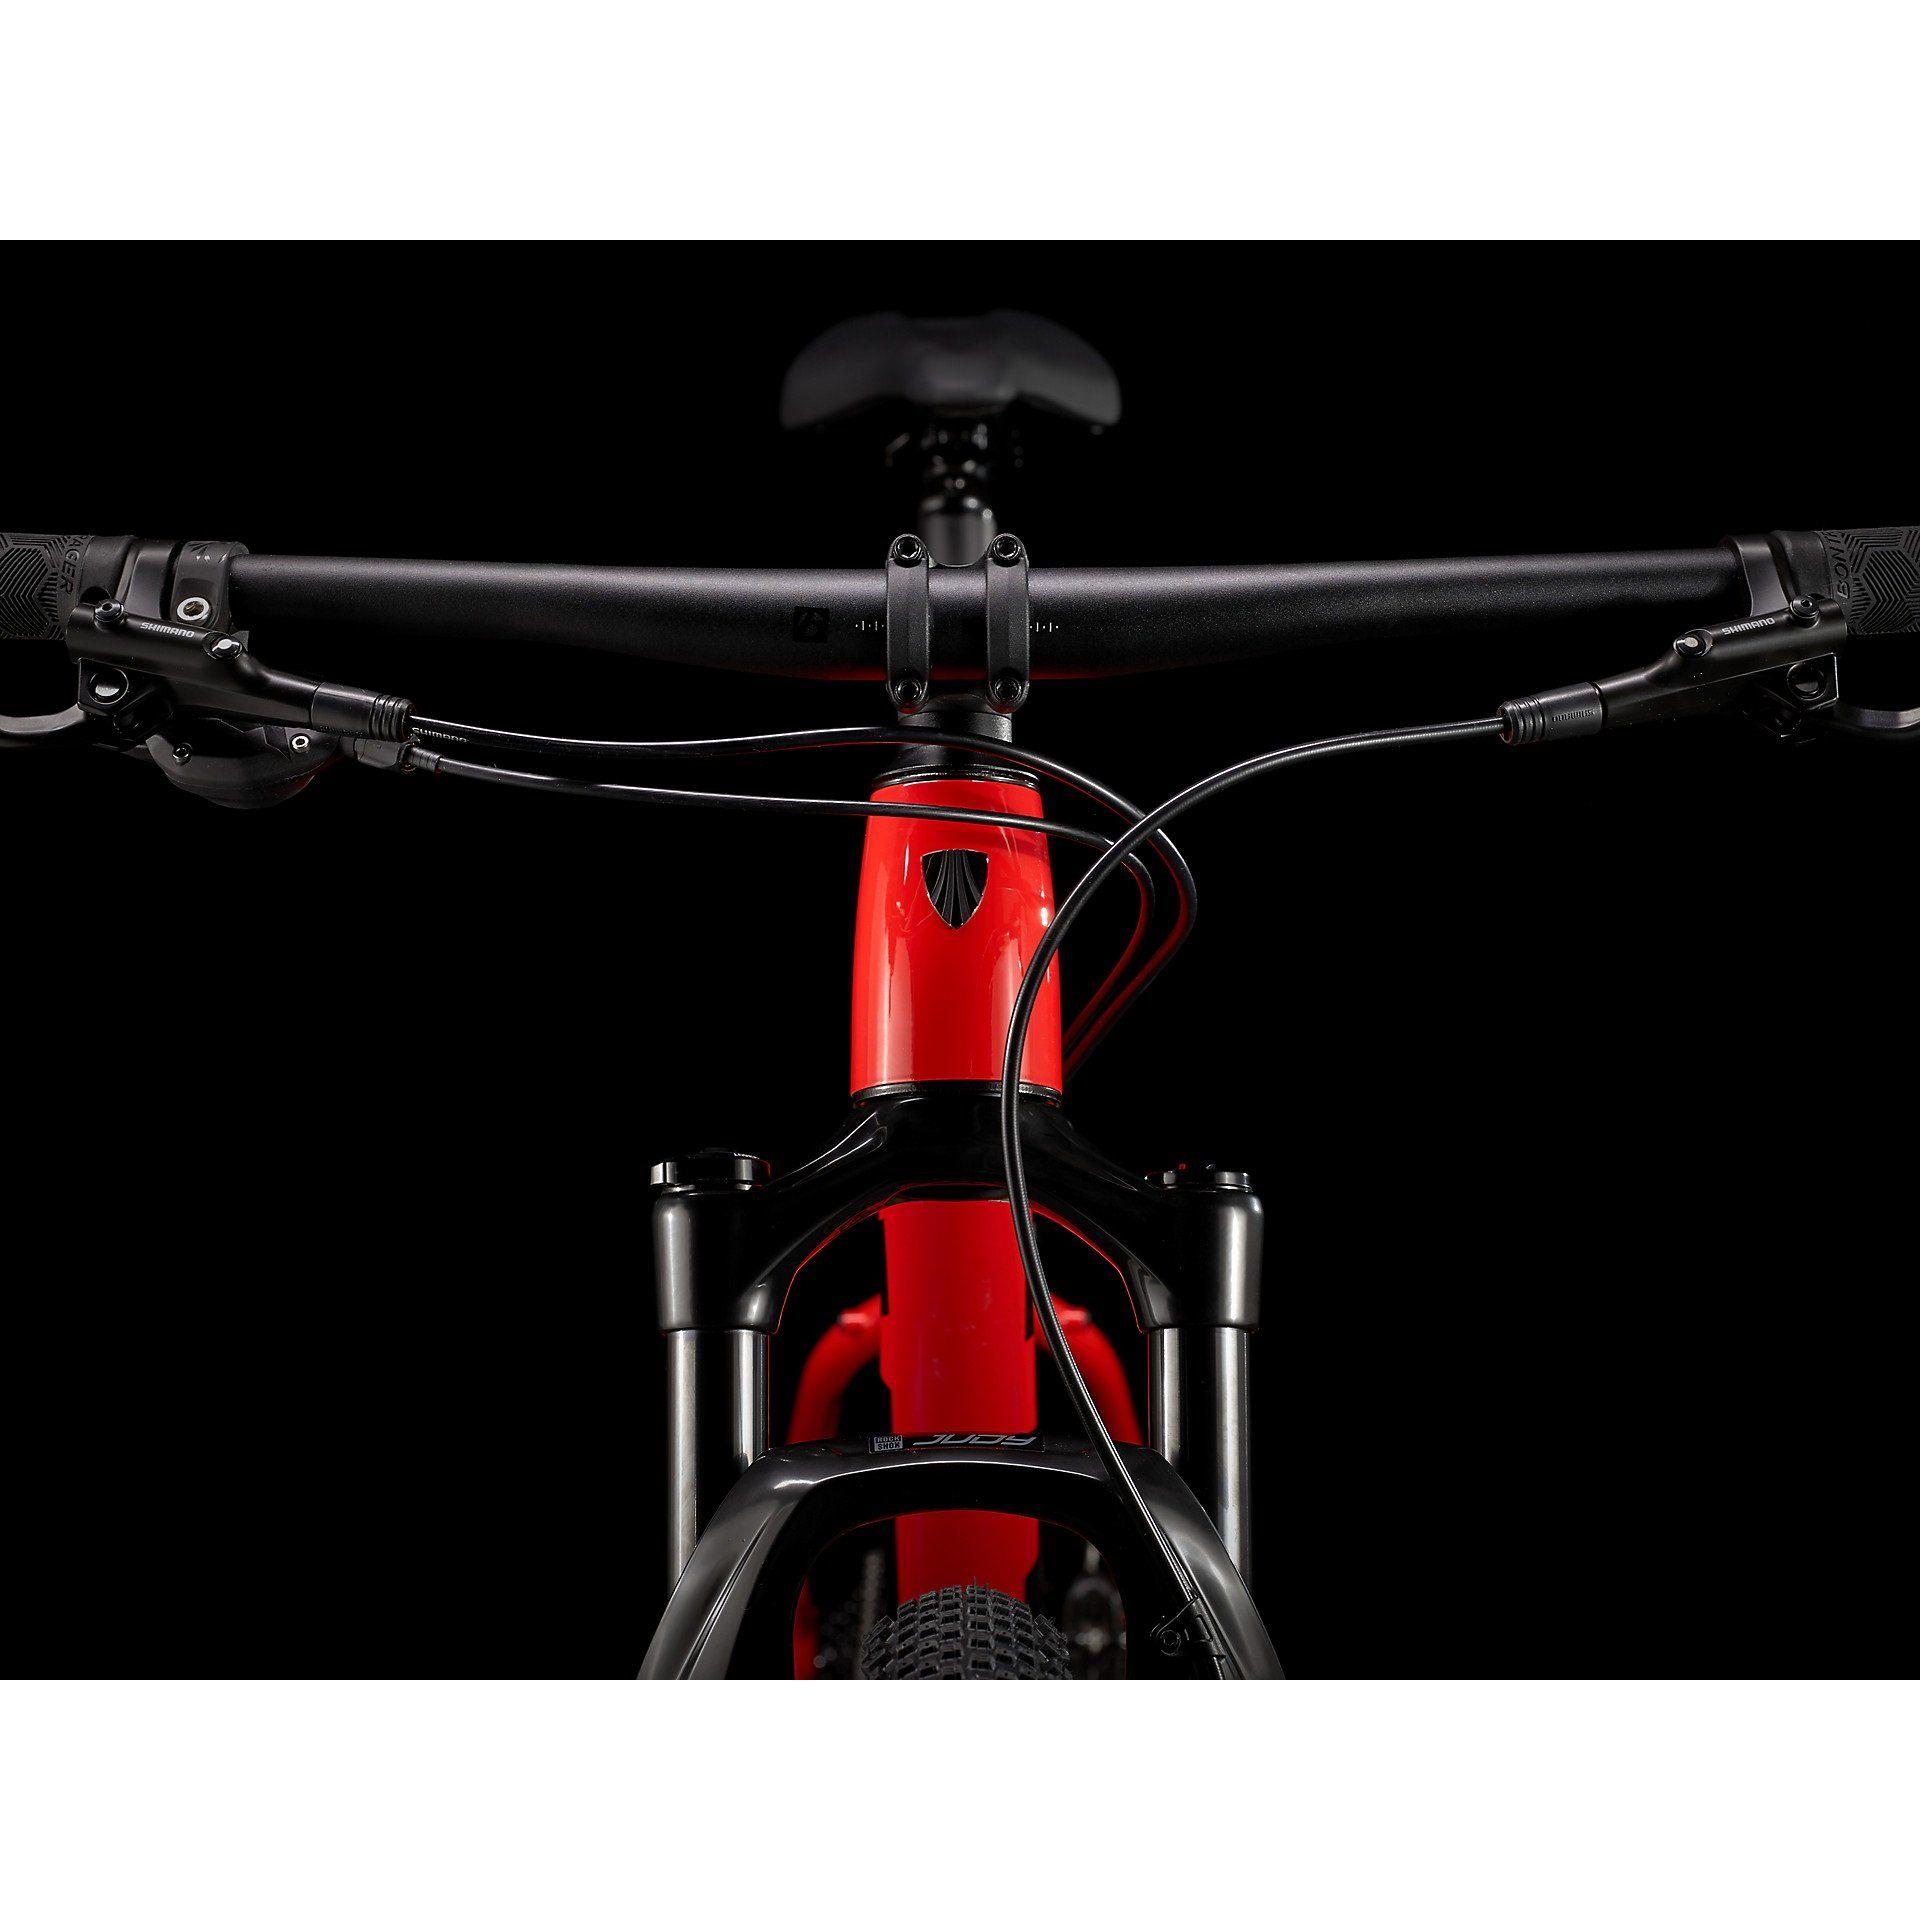 ROWER TREK X-CALIBER 8 RADIOACTIVE RED|TREK BLACK 9